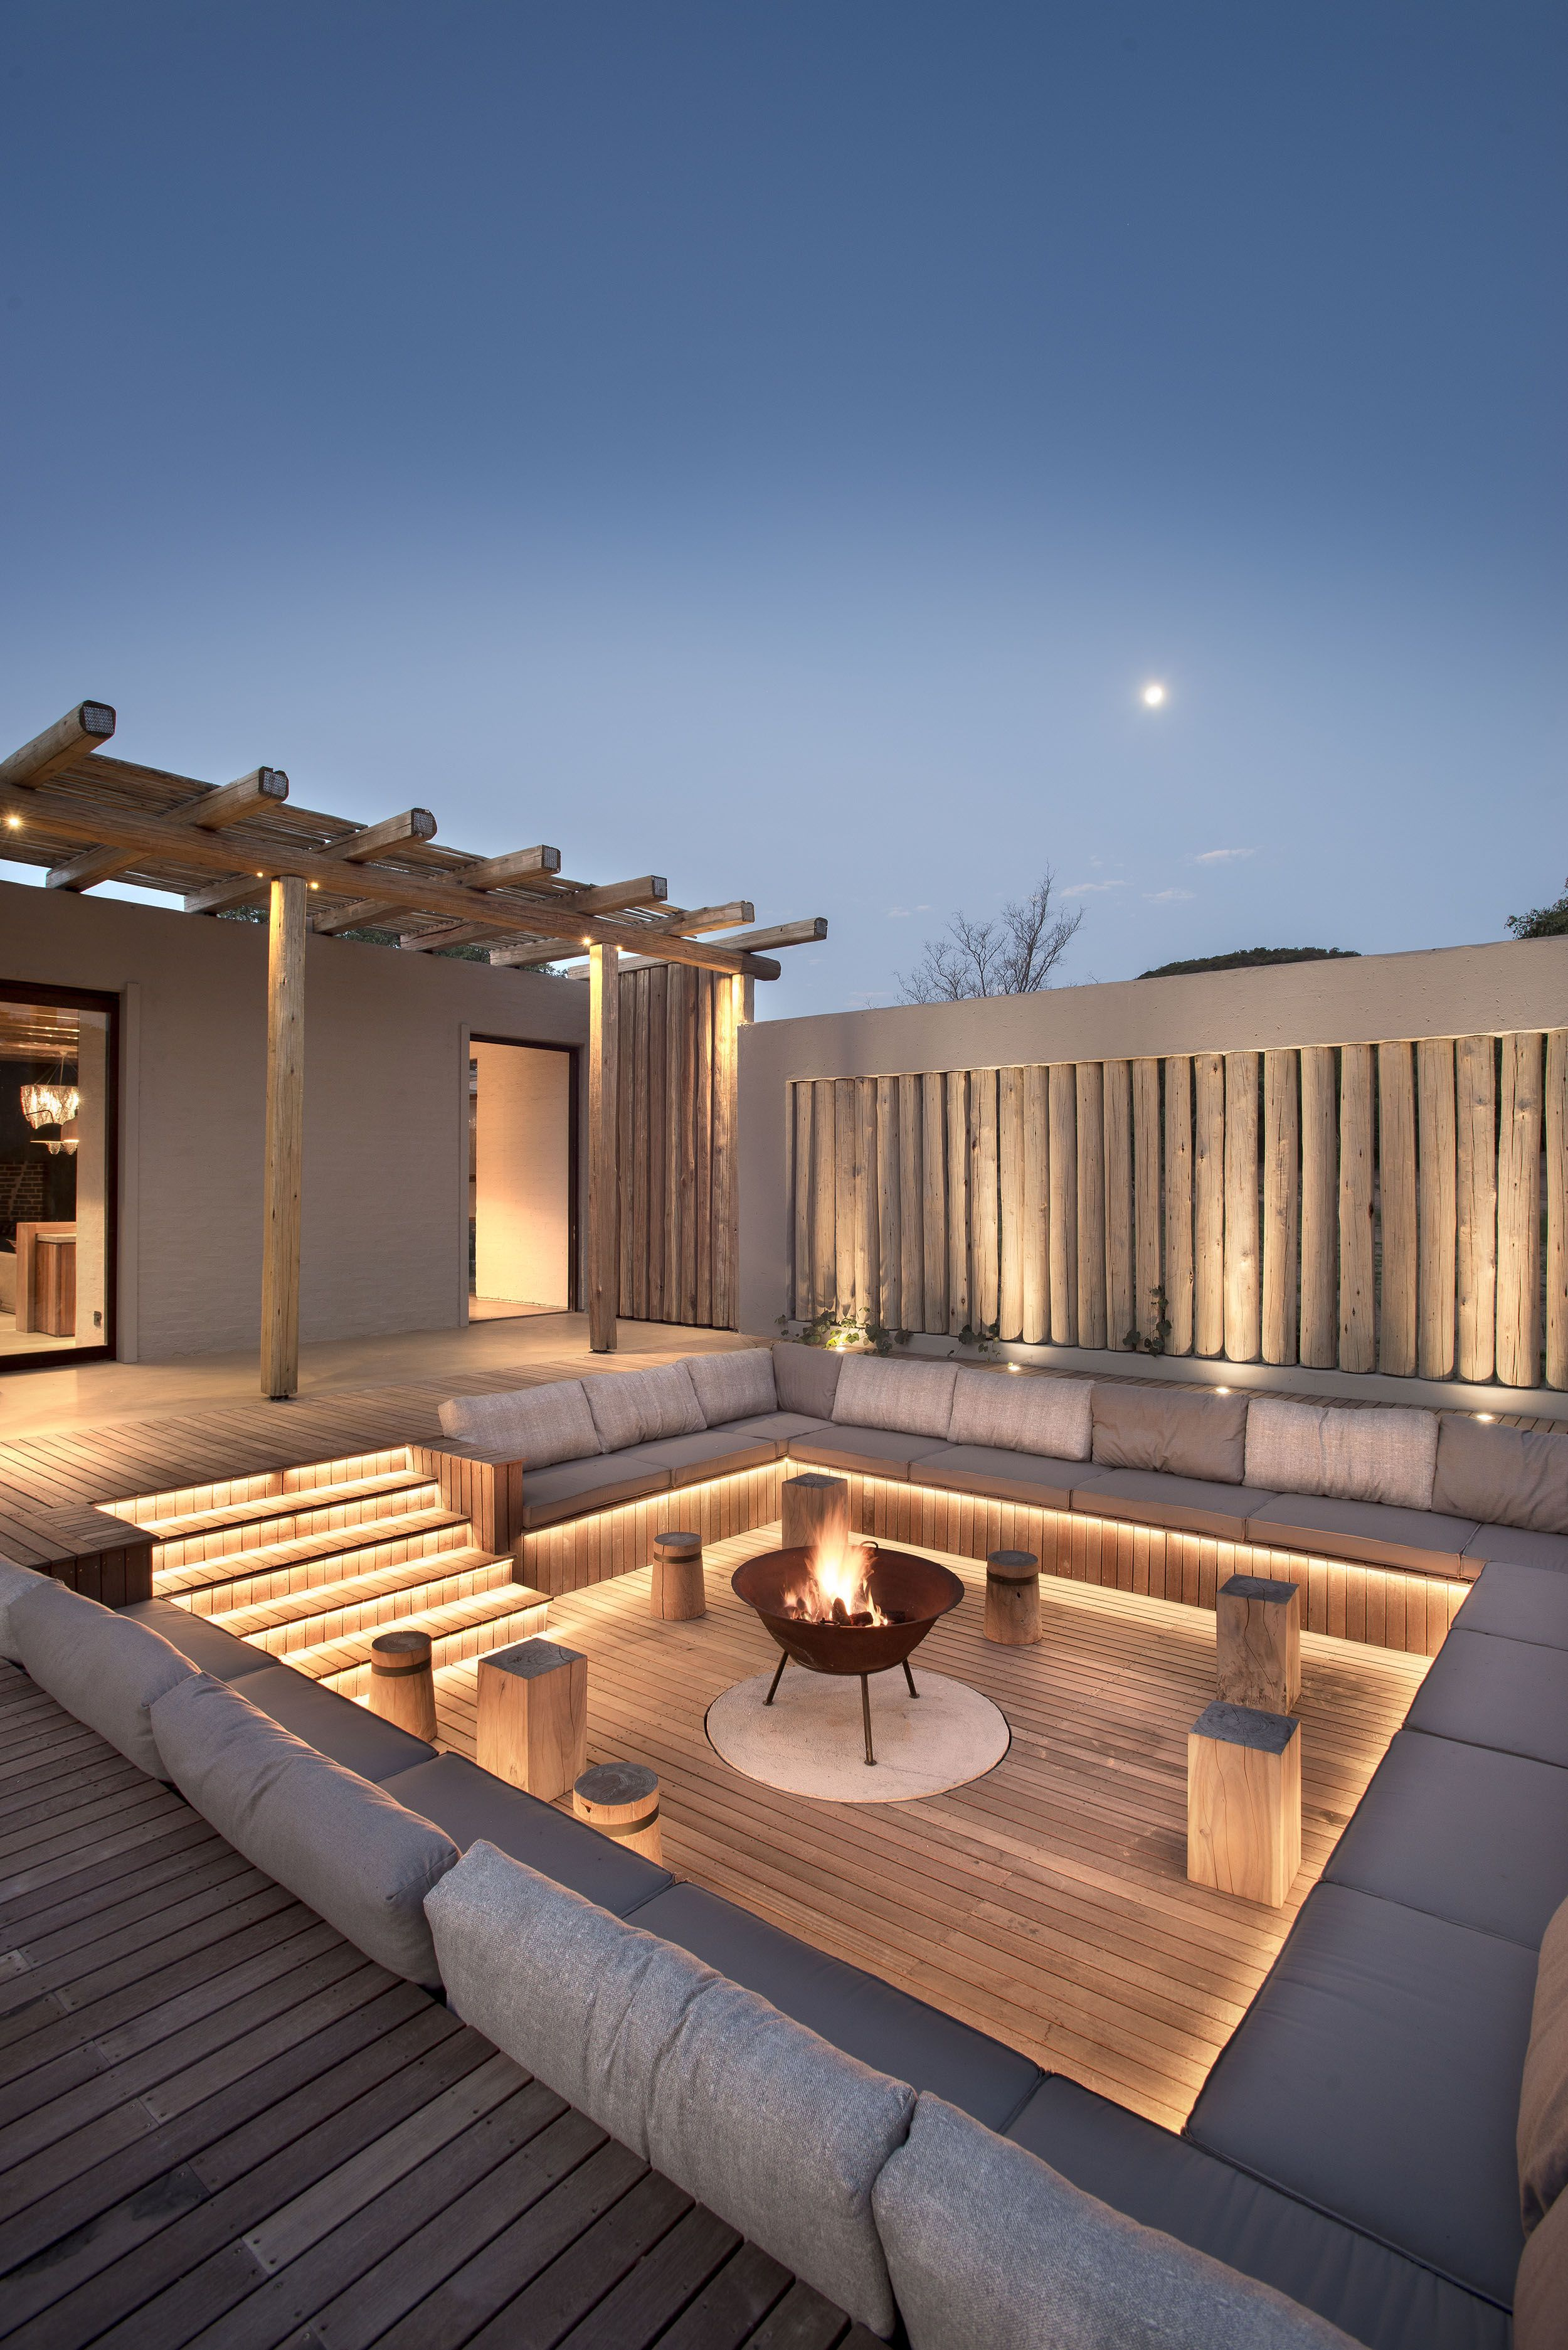 Private Bush Home Waterberg South Africa Fox Browne Creative In 2020 Backyard Patio Designs Rooftop Design Patio Design